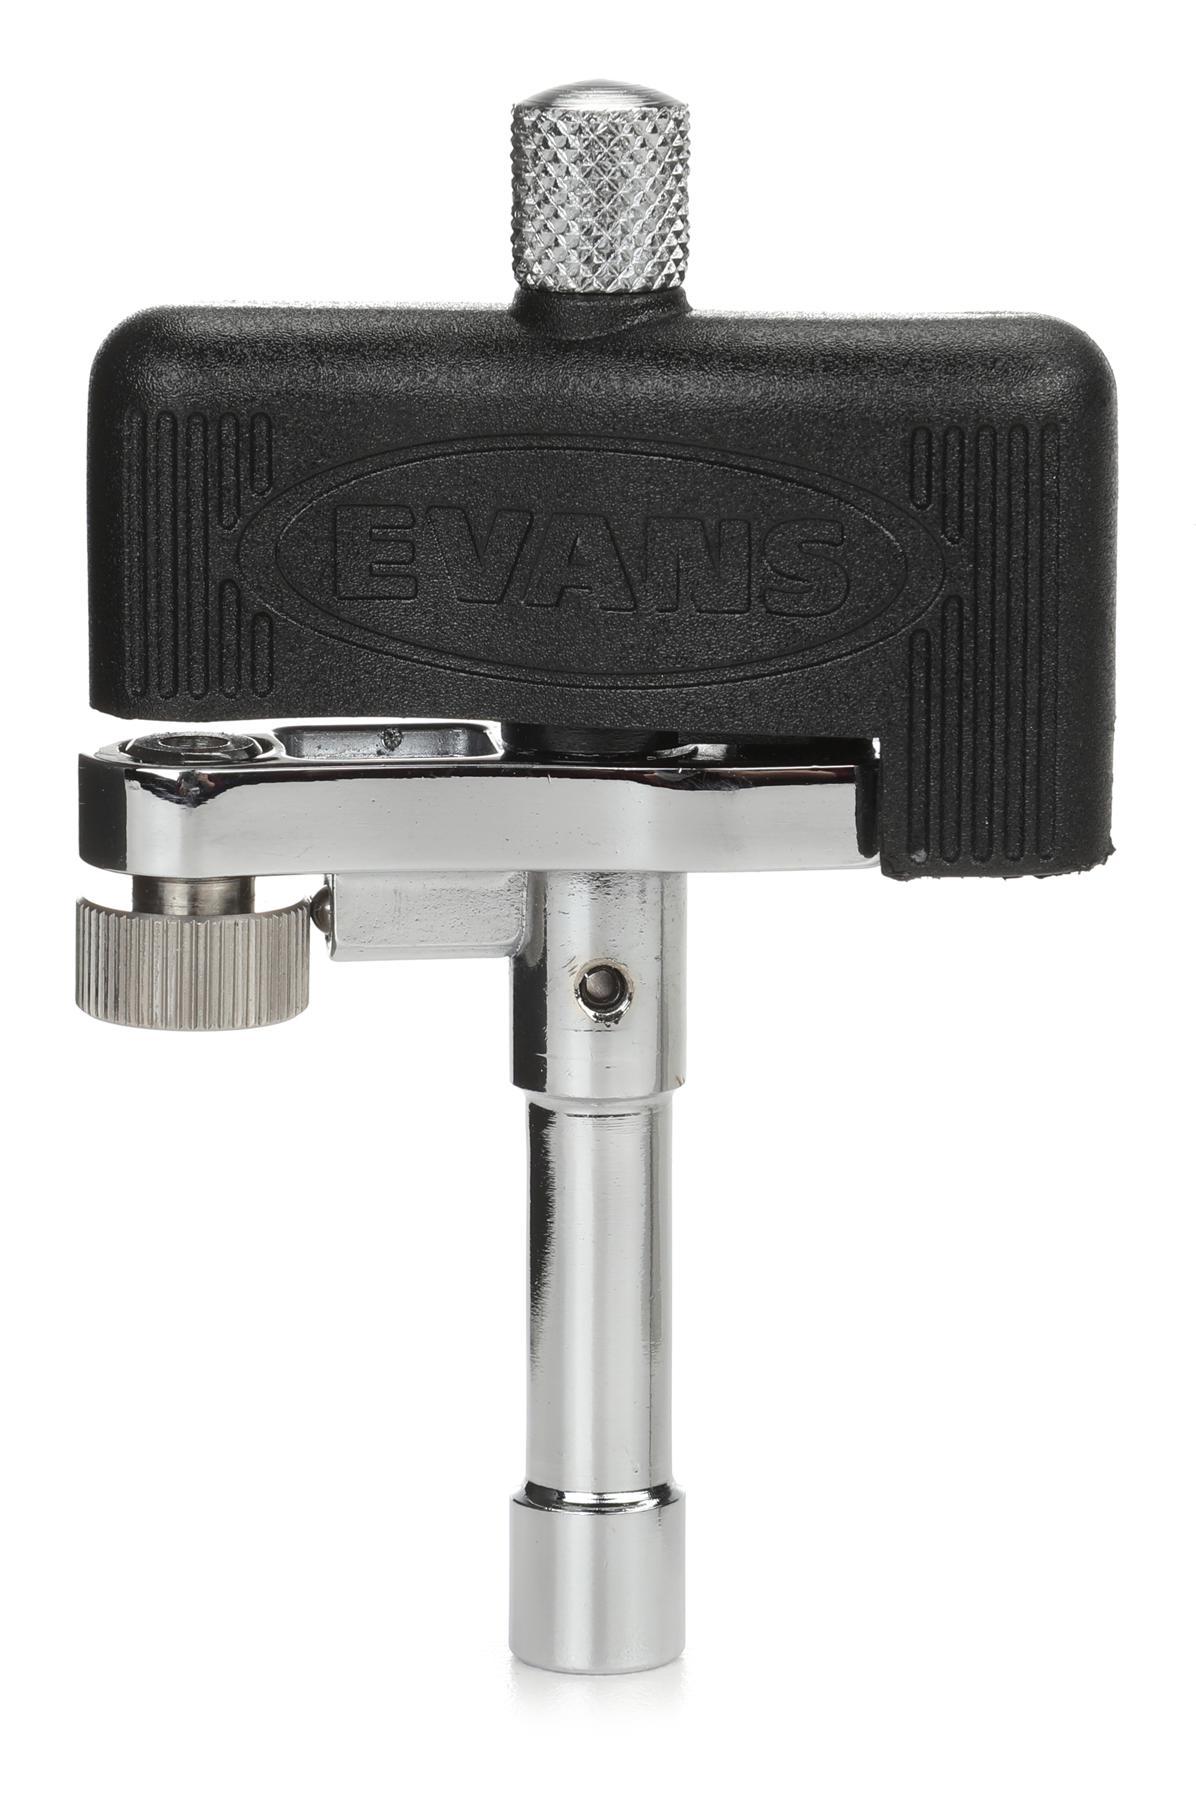 3. Evans Torque Key